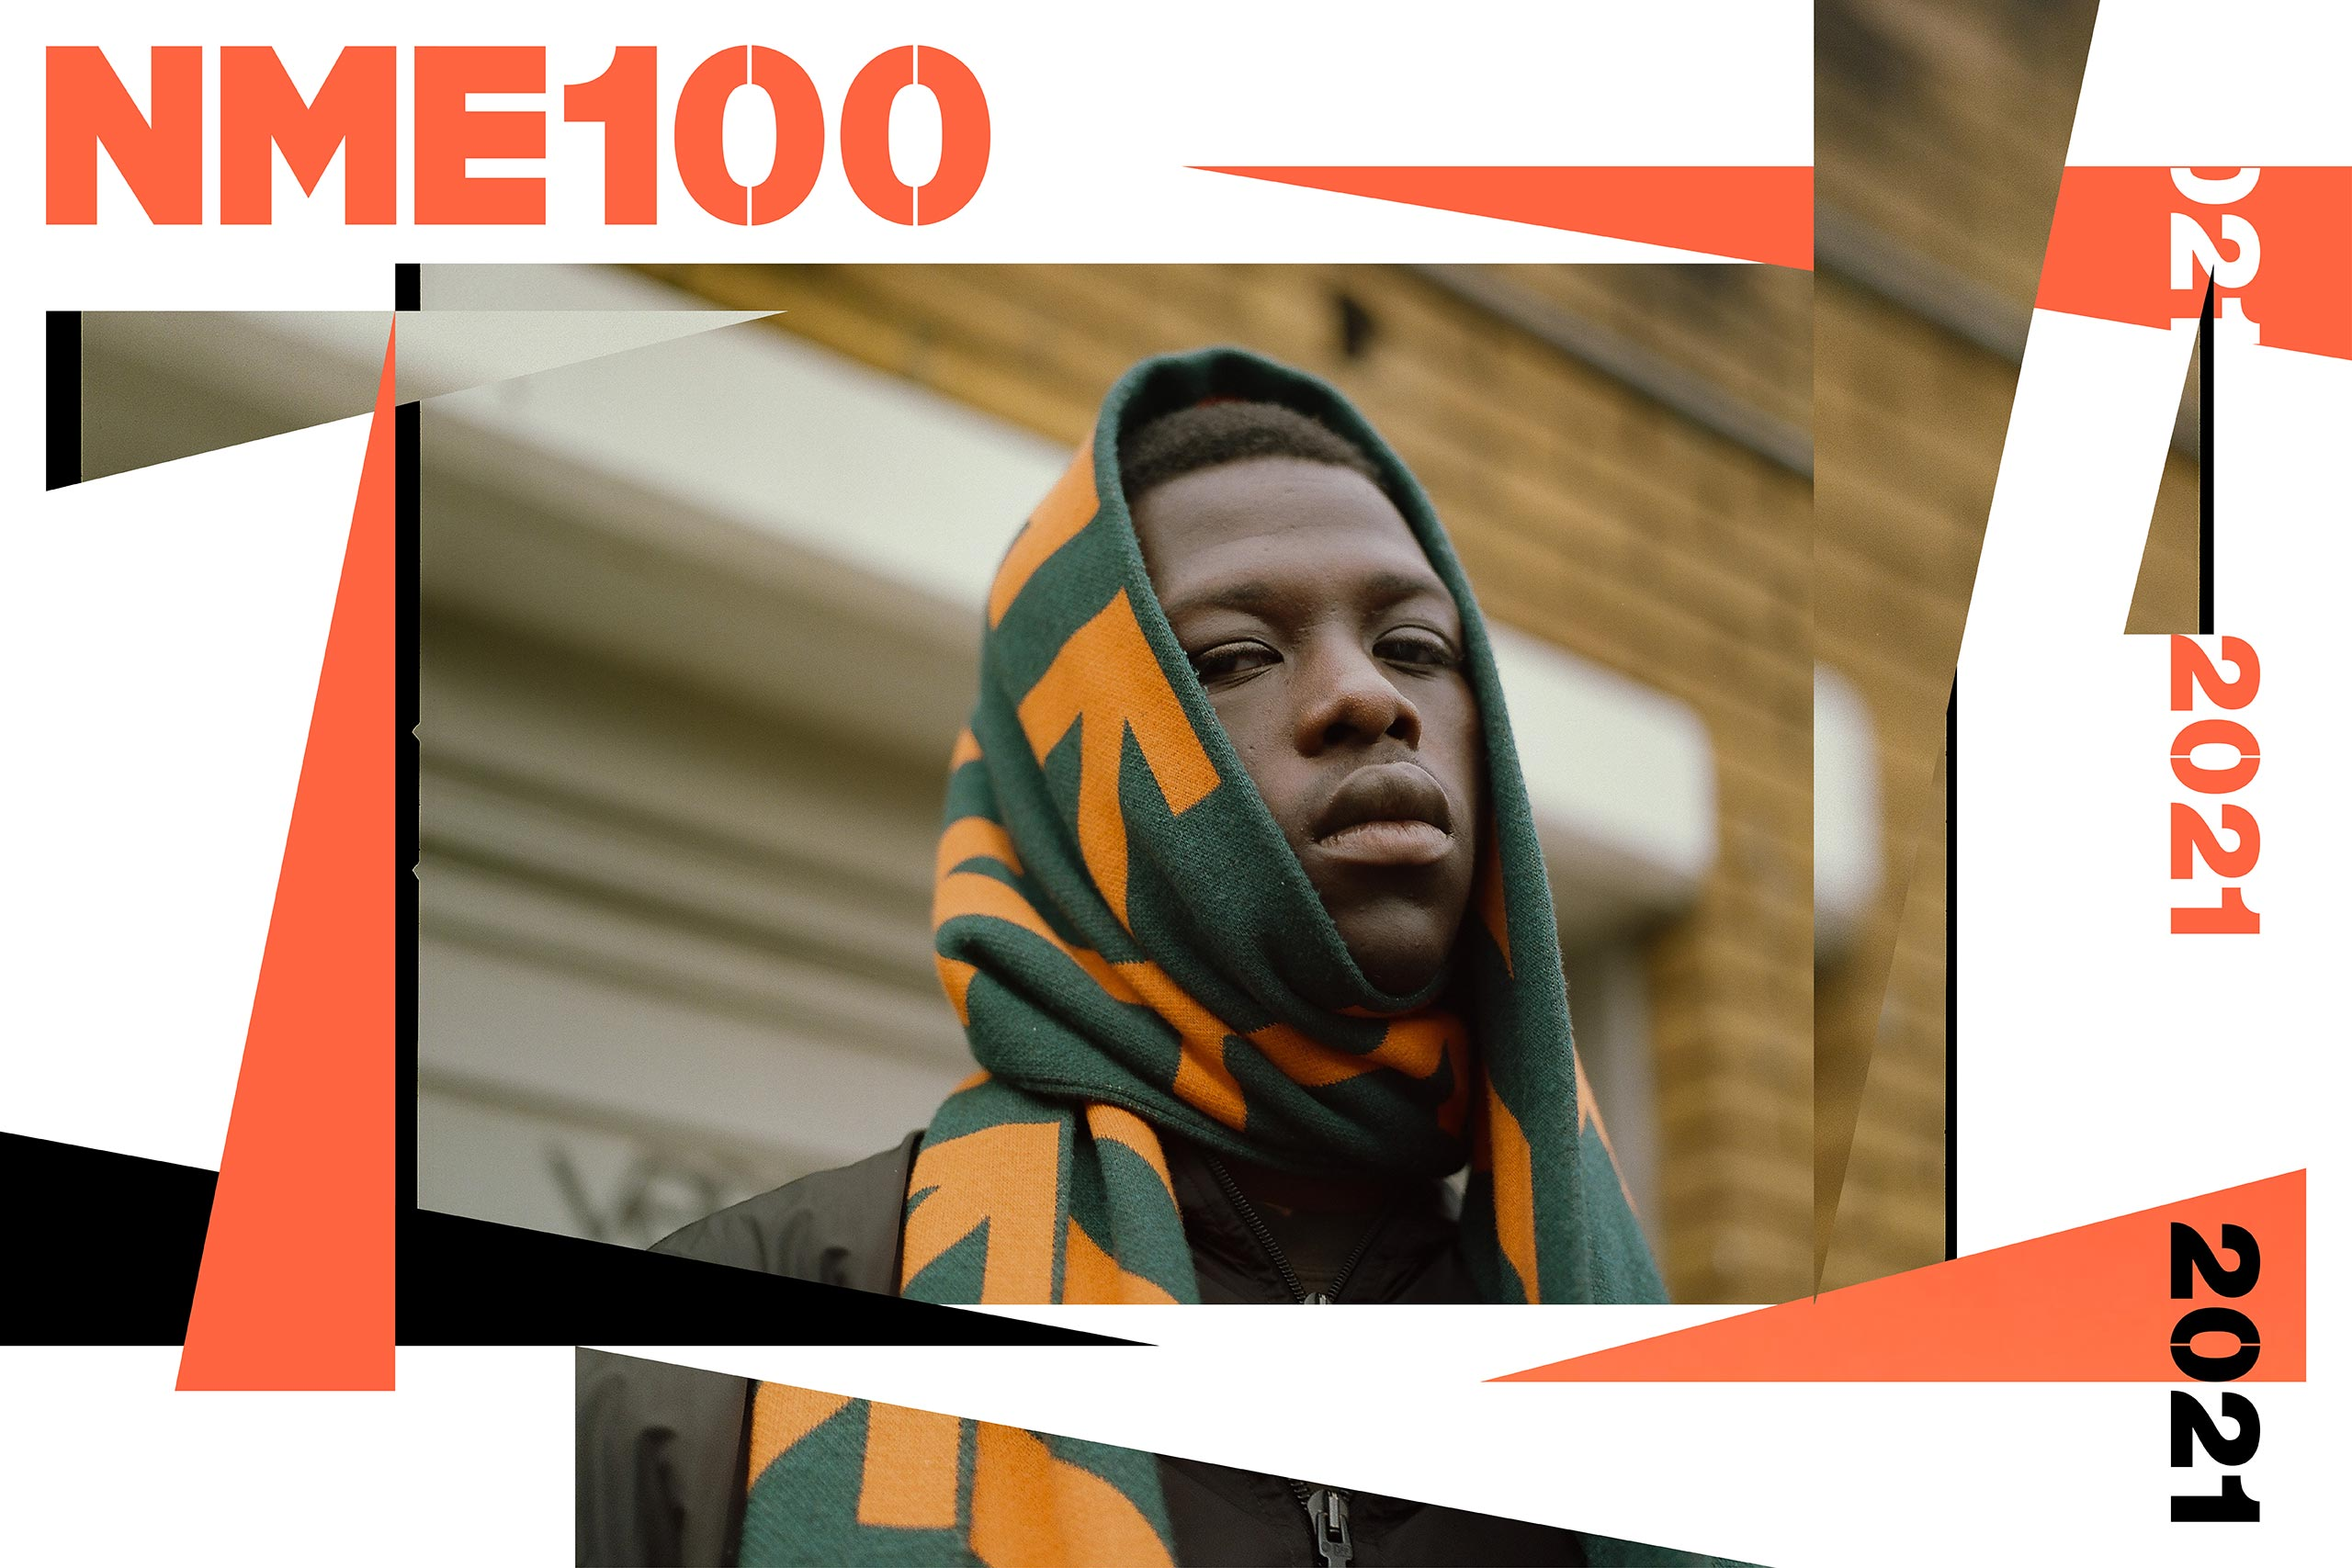 NME 100 pa salieu